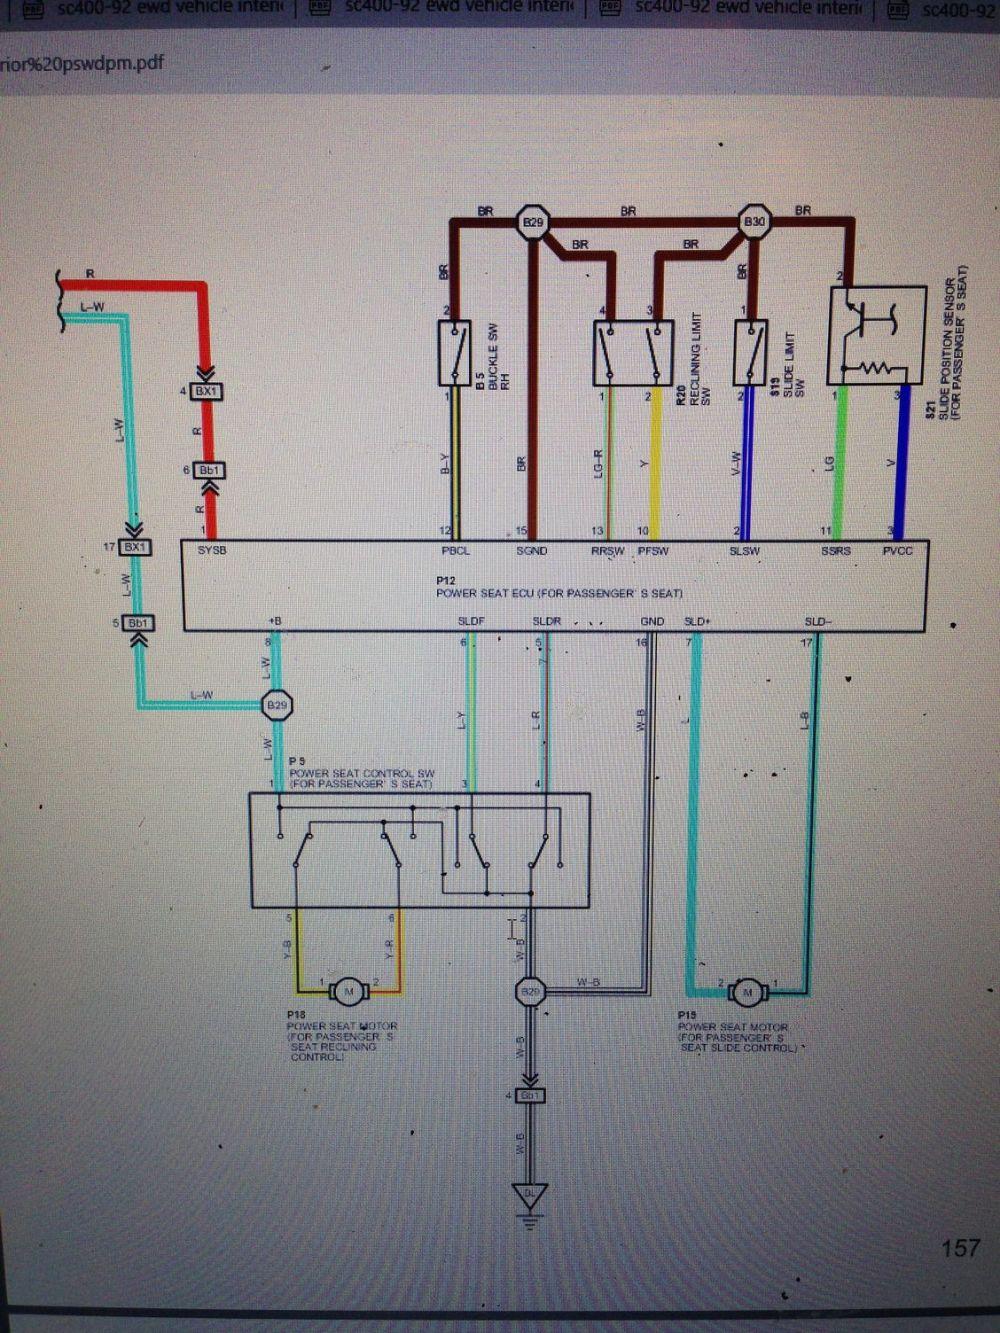 medium resolution of power seat wiring diagram 92 lexus sc 300 wiring todaypower seat wiring diagram 92 lexus sc